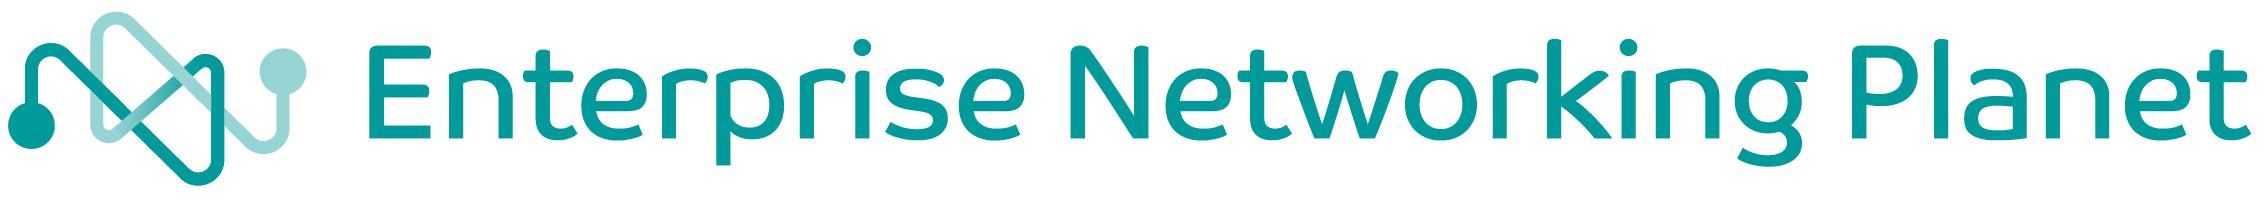 Enterprise Networking Planet (ENP)